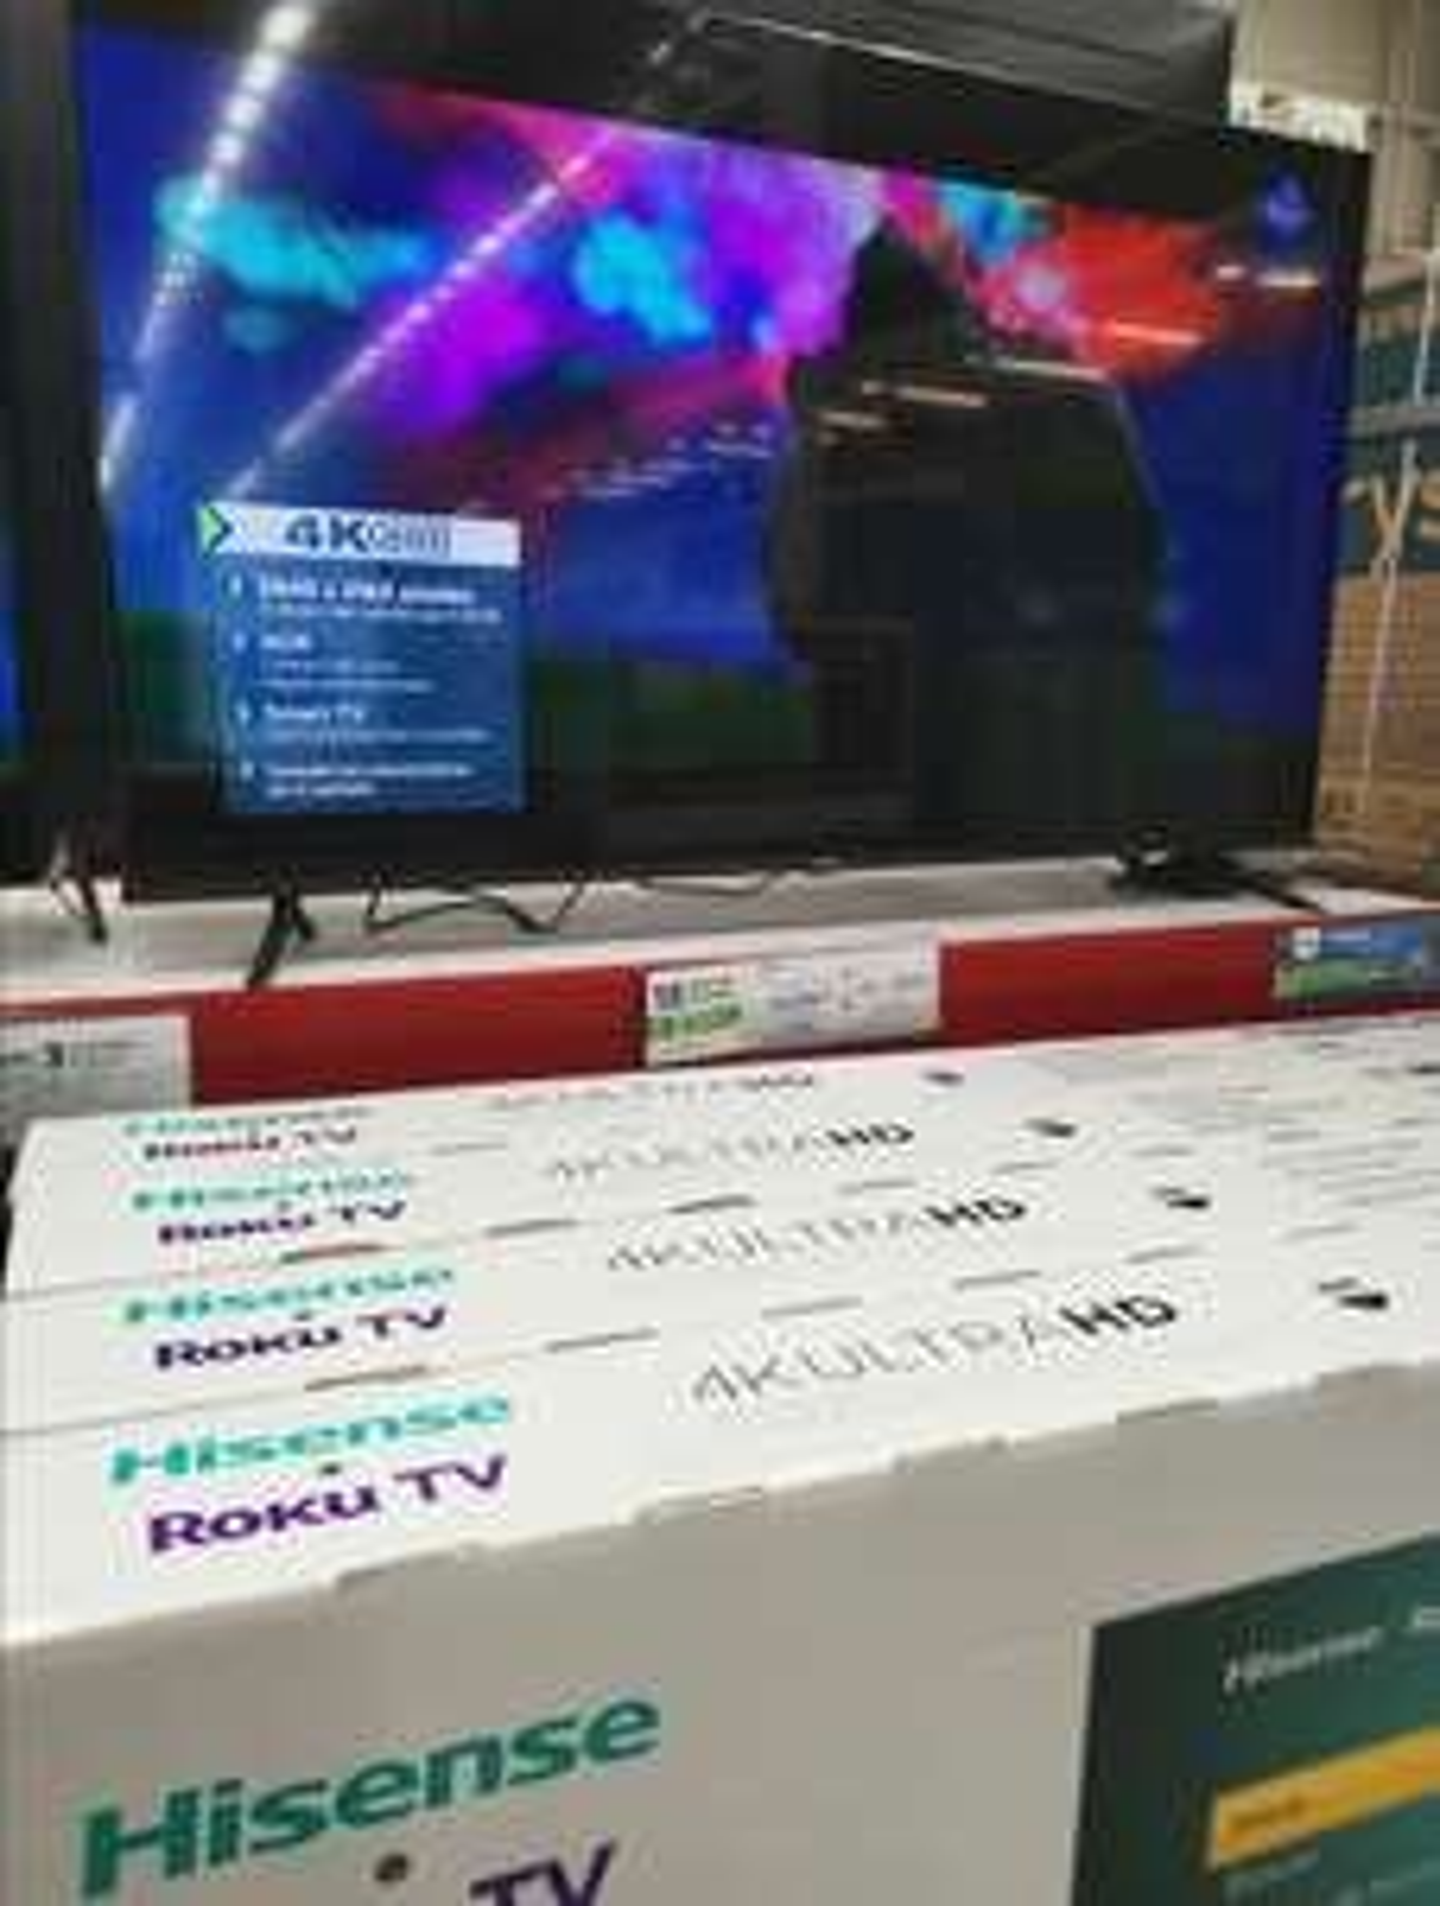 Sams Club : TV Hisense 65 pulgadas 4K UHD con roku TV y otra